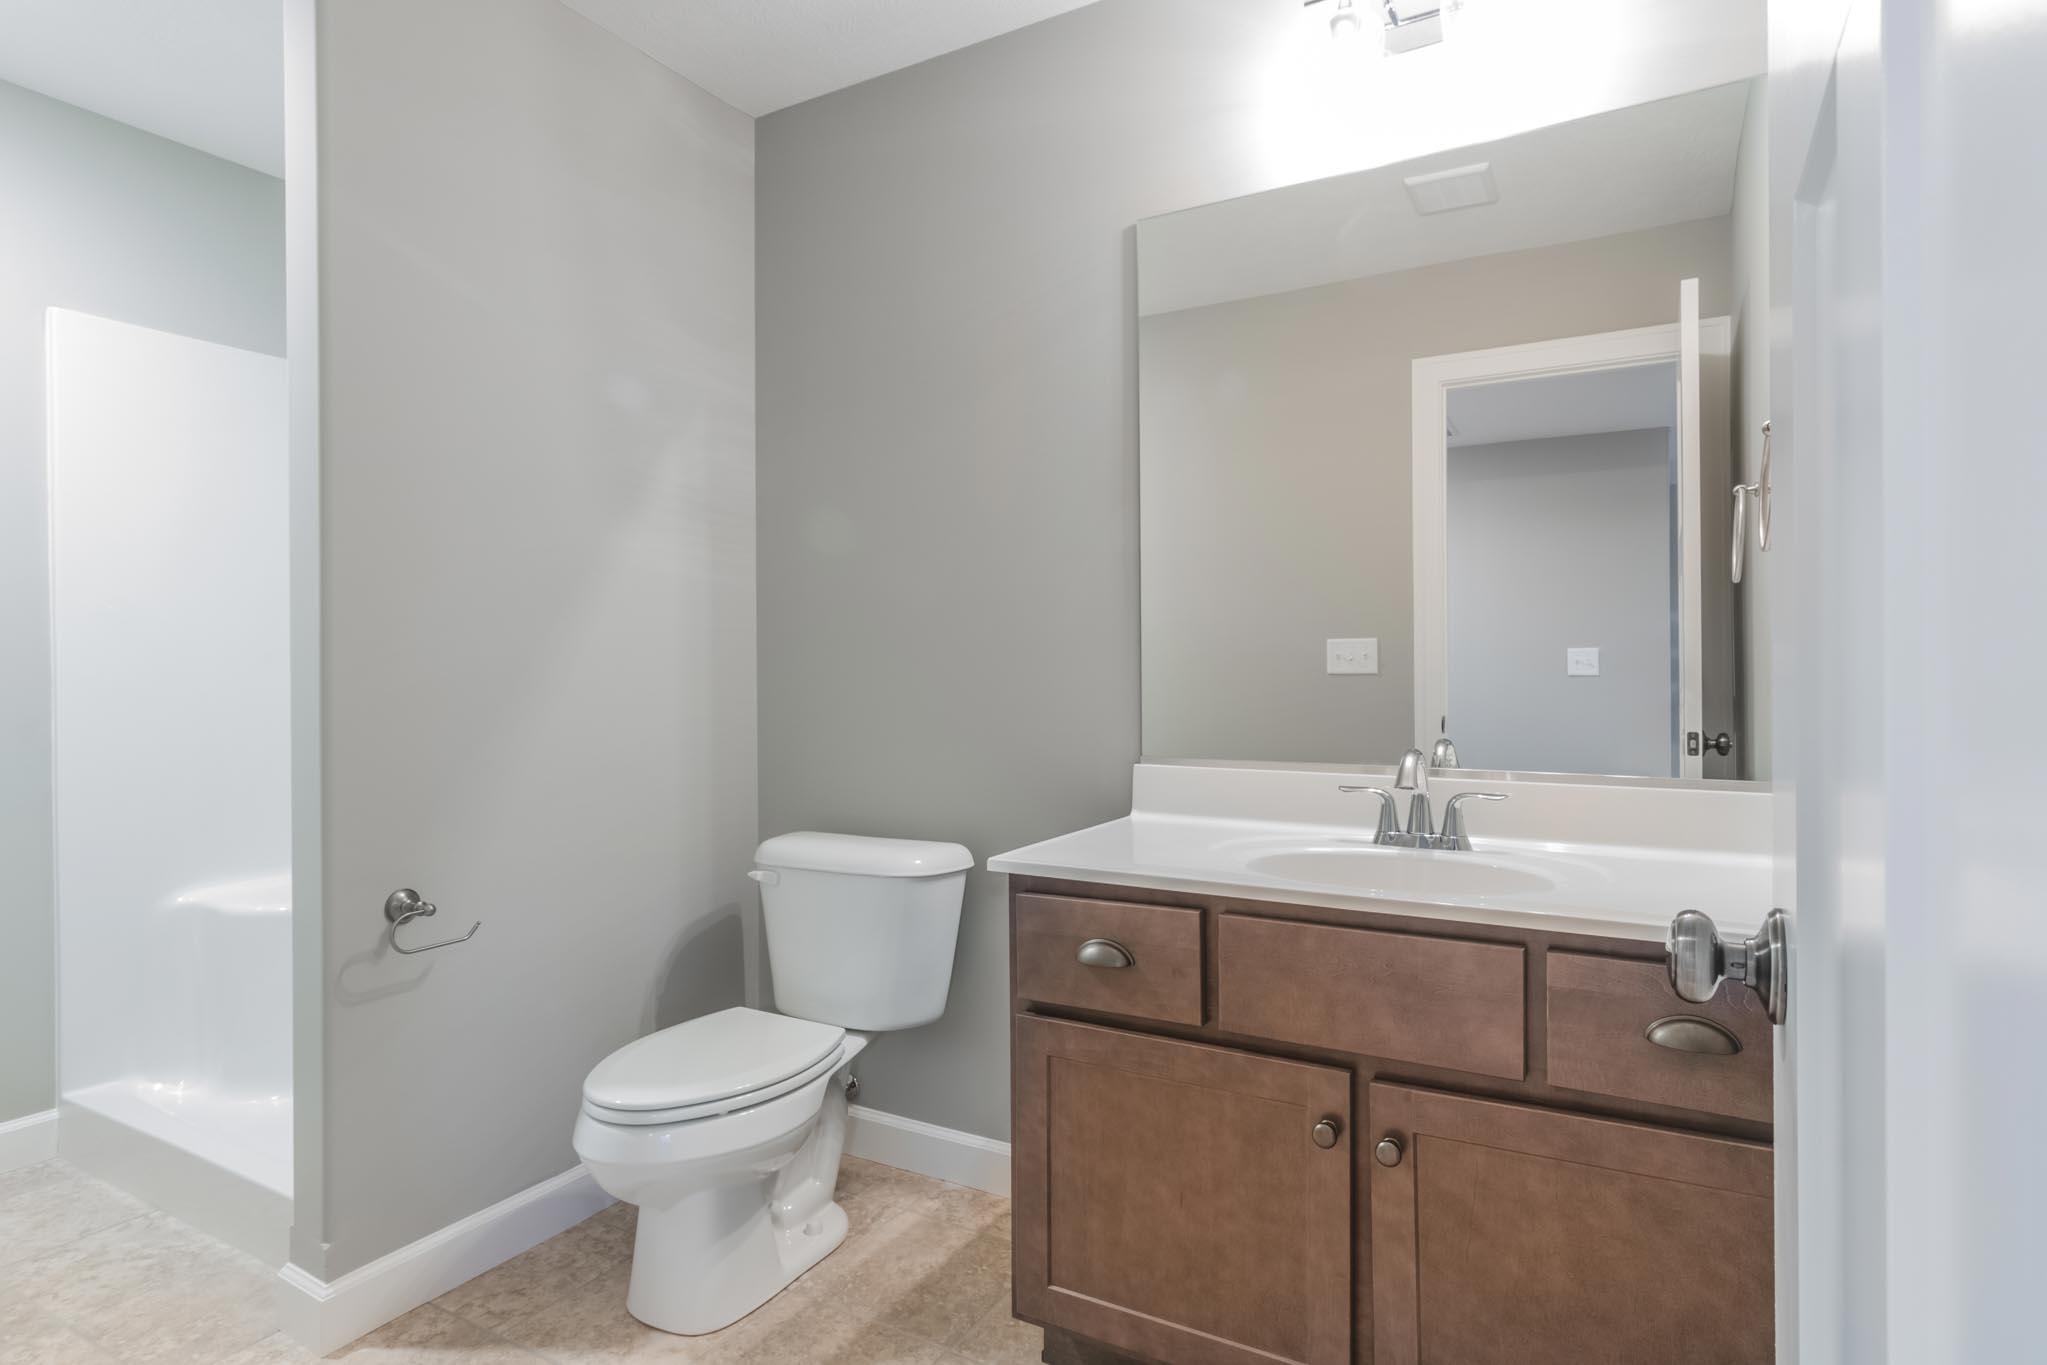 1815 Pfitzer bathroom 2 in Normal IL home for sale